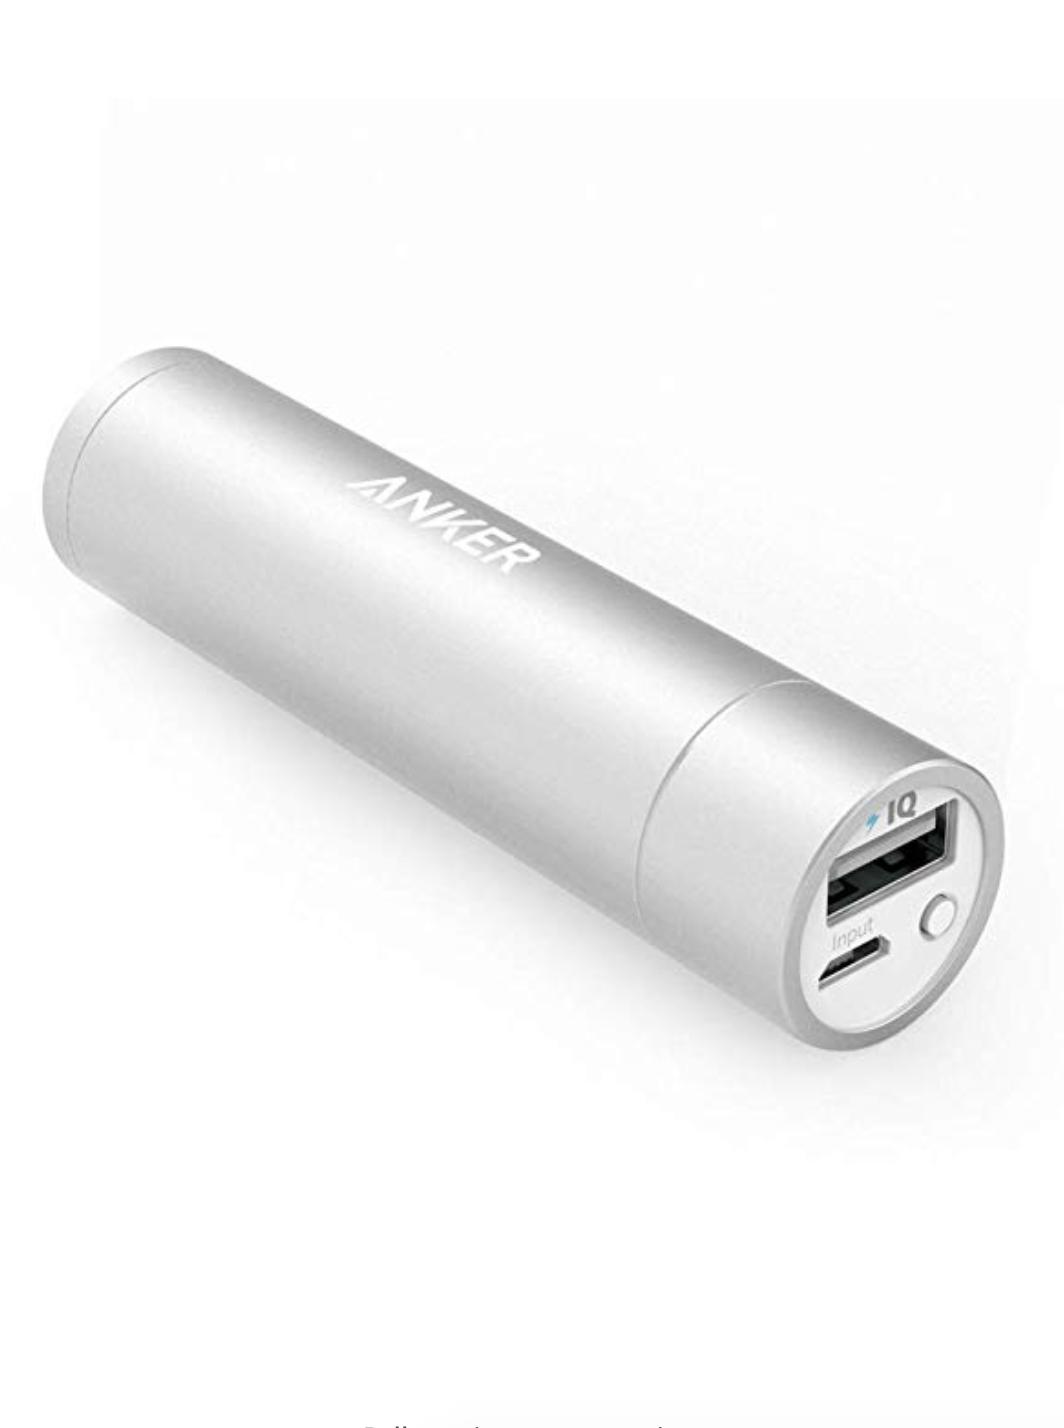 Anker PowerCore+ Mini, 3350mAh Lipstick-Sized Portable Charger